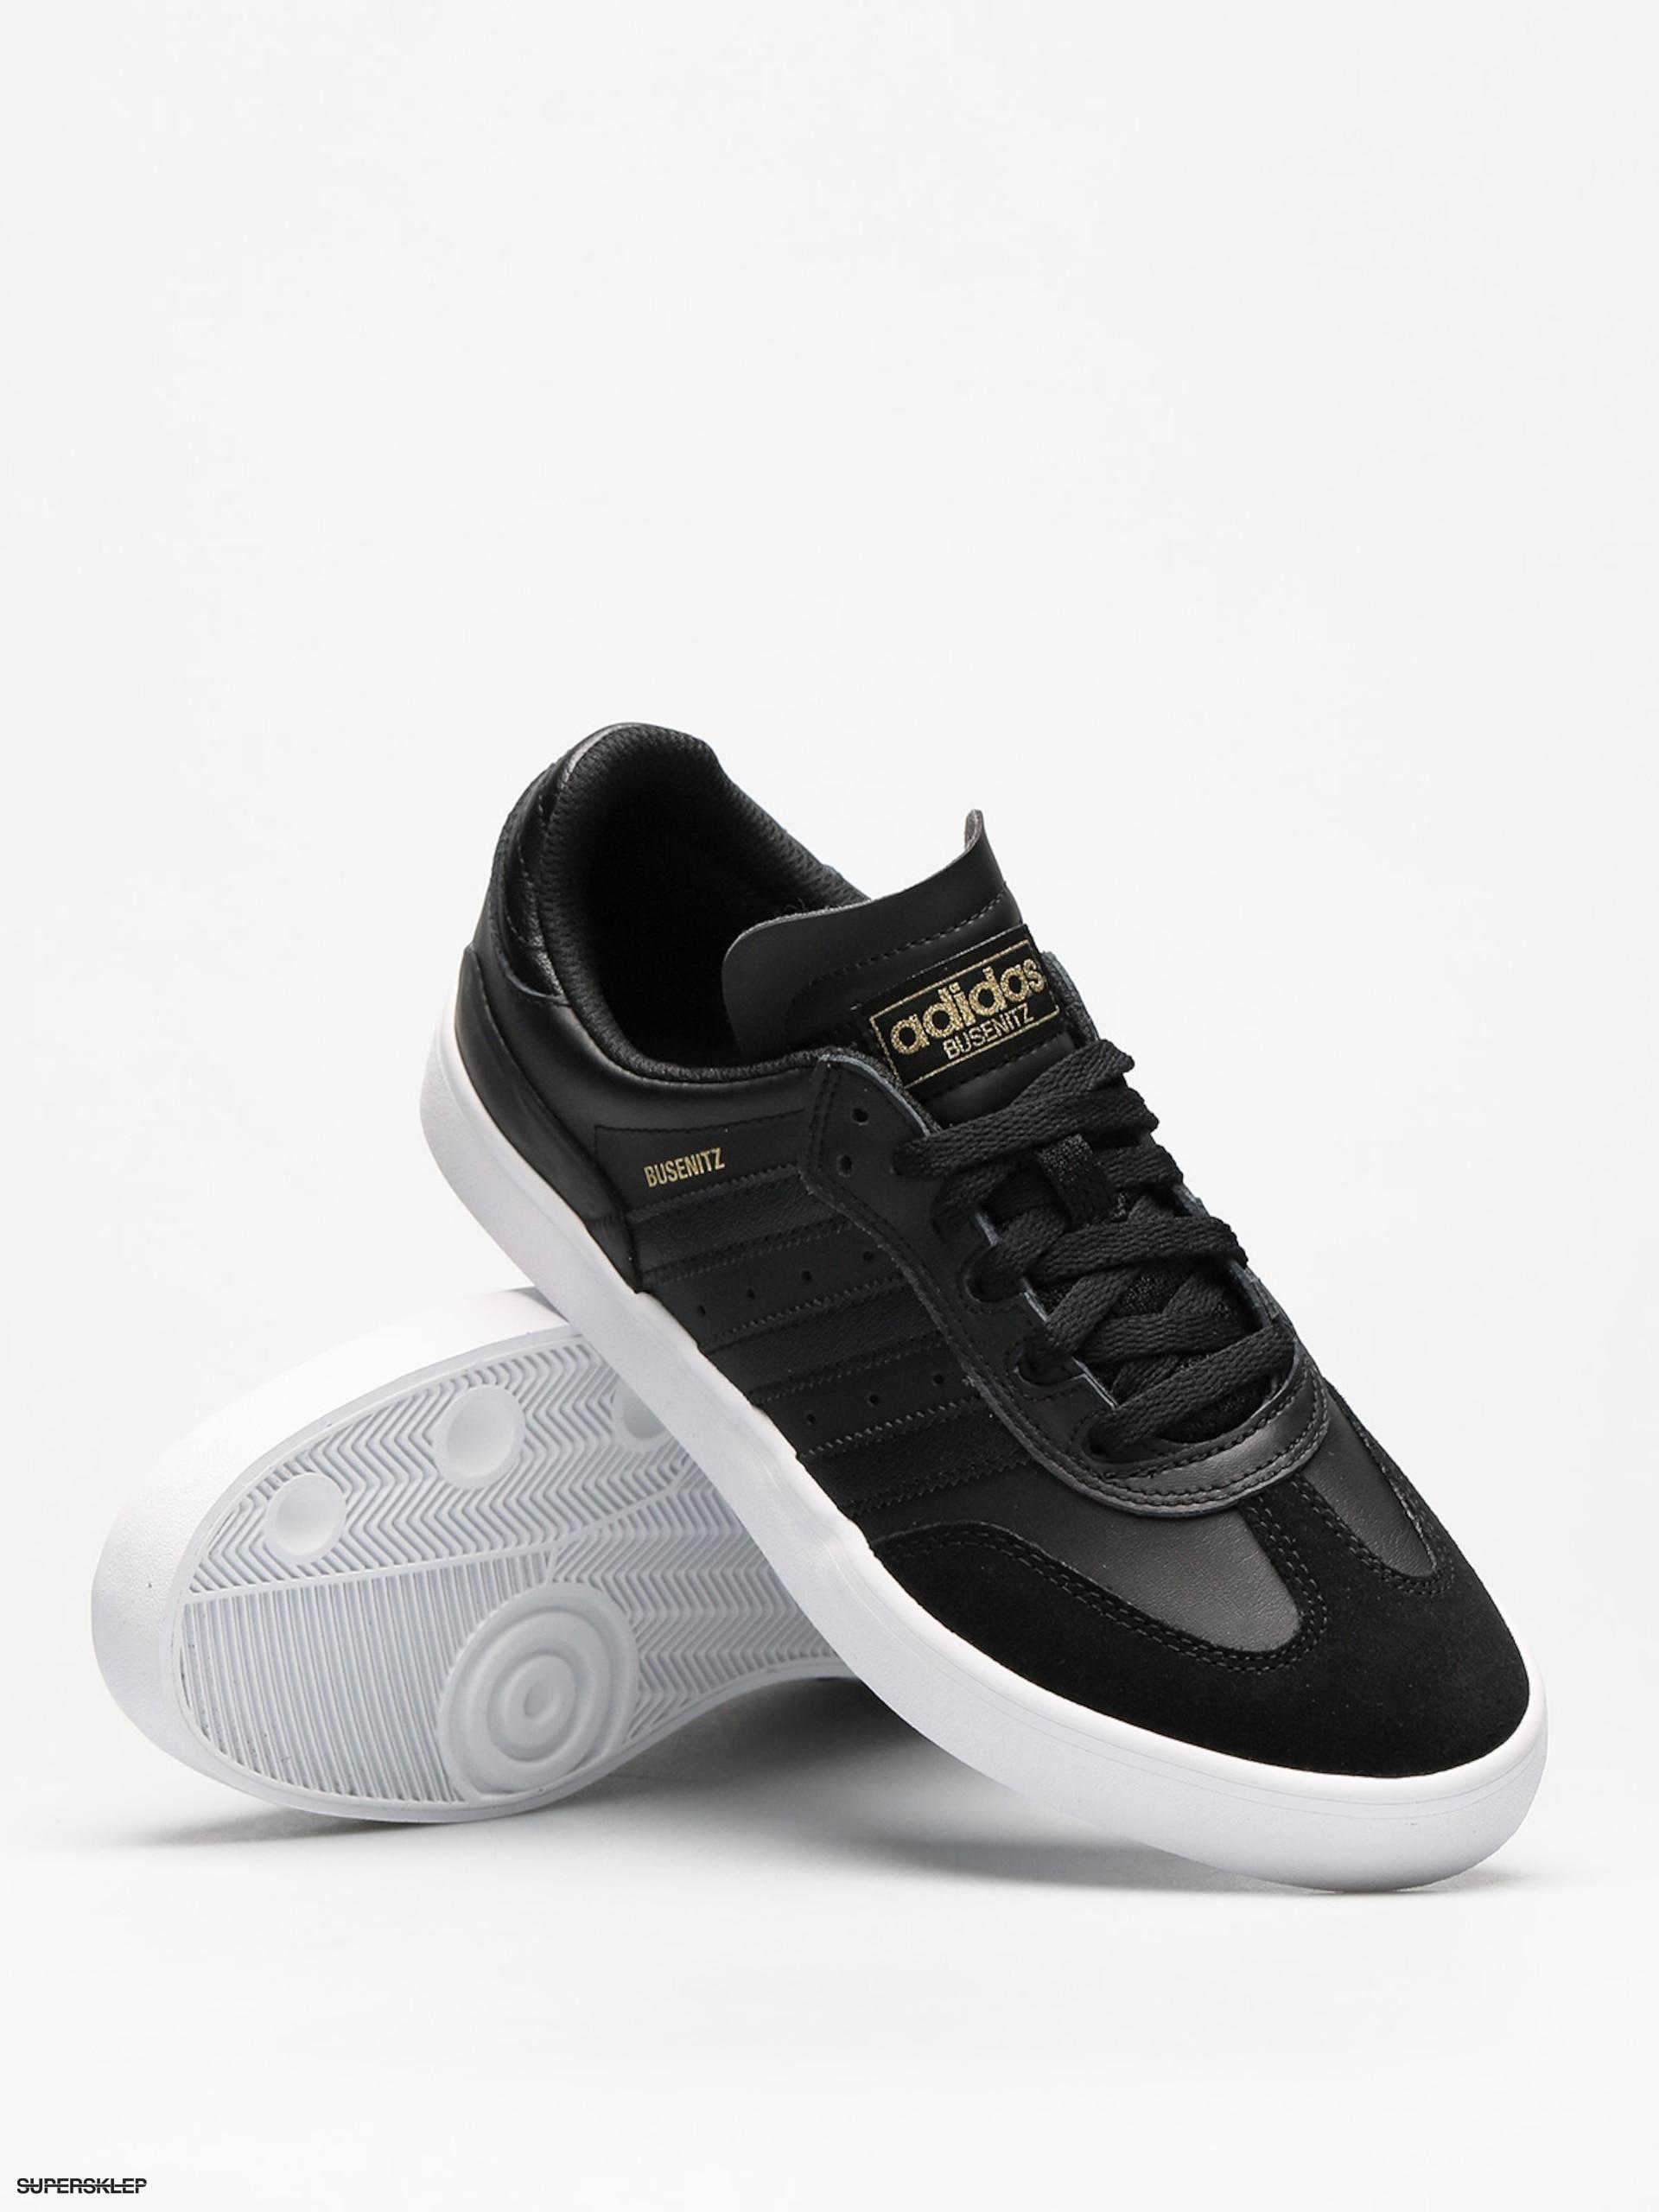 186161d18 Buty adidas Busenitz Vulc Rx (core black/core black/ftwr white)